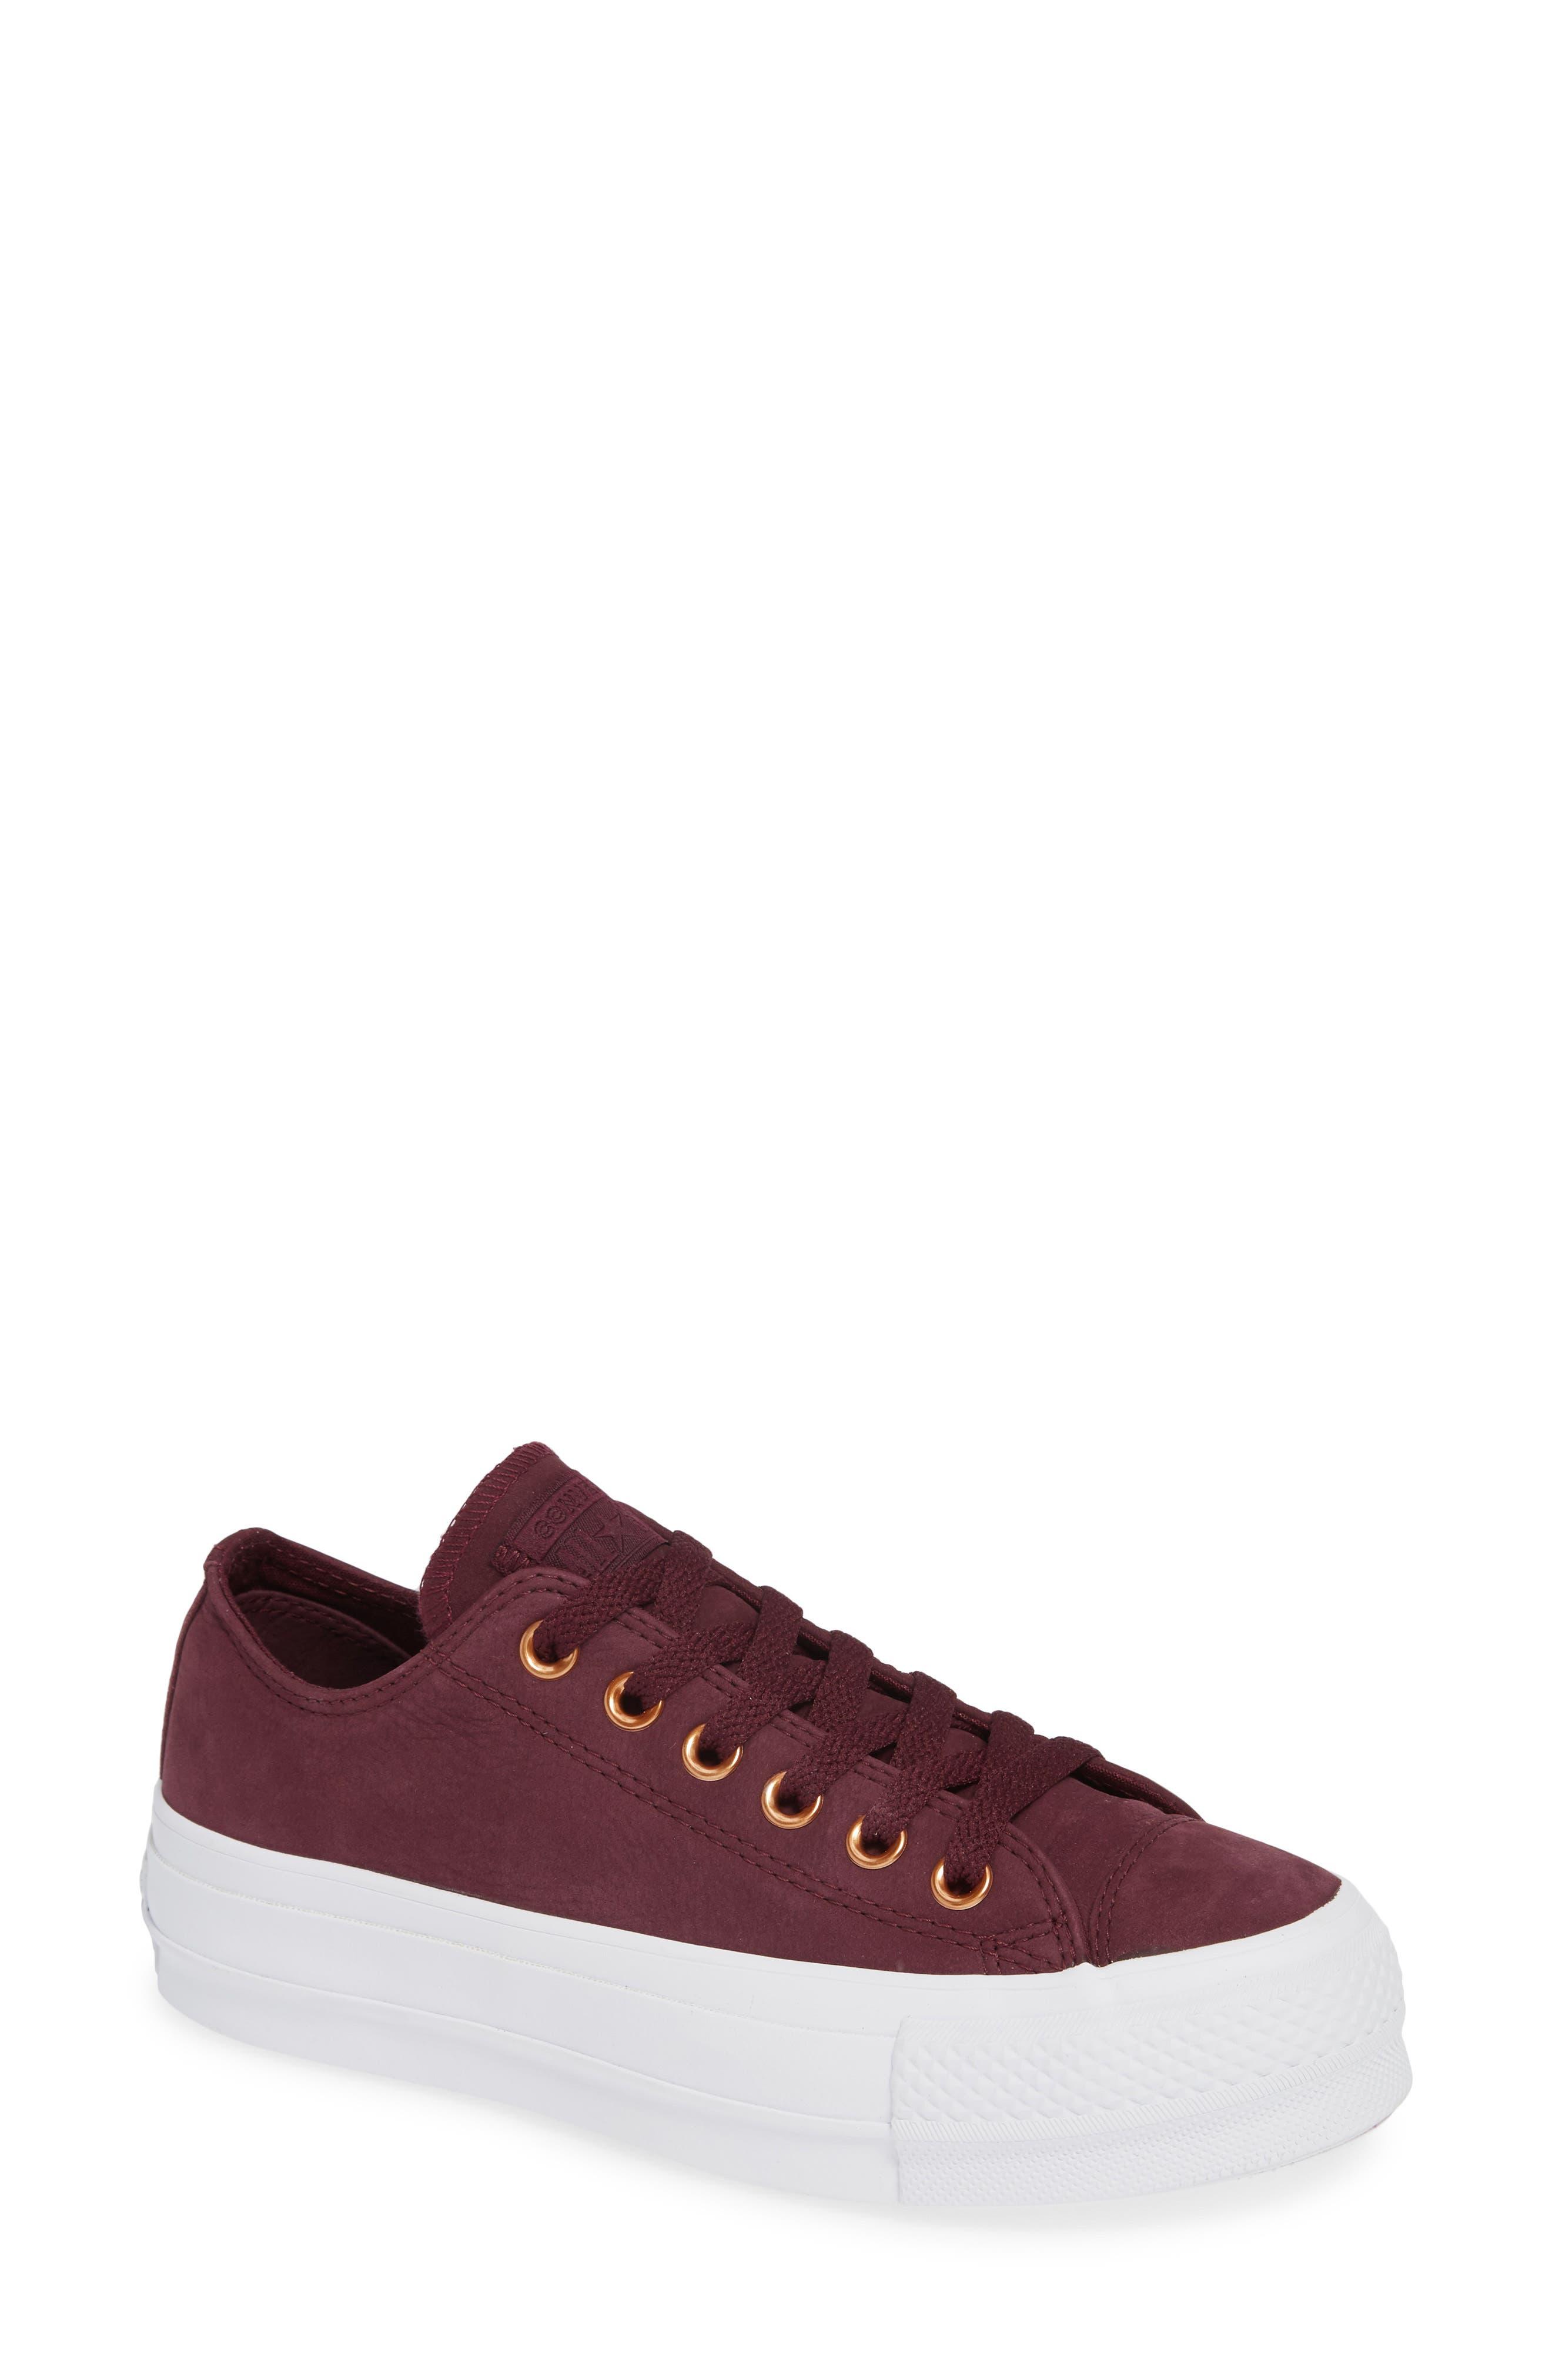 Chuck Taylor<sup>®</sup> All Star<sup>®</sup> Platform Sneaker,                             Main thumbnail 1, color,                             Dark Sangria Nubuck